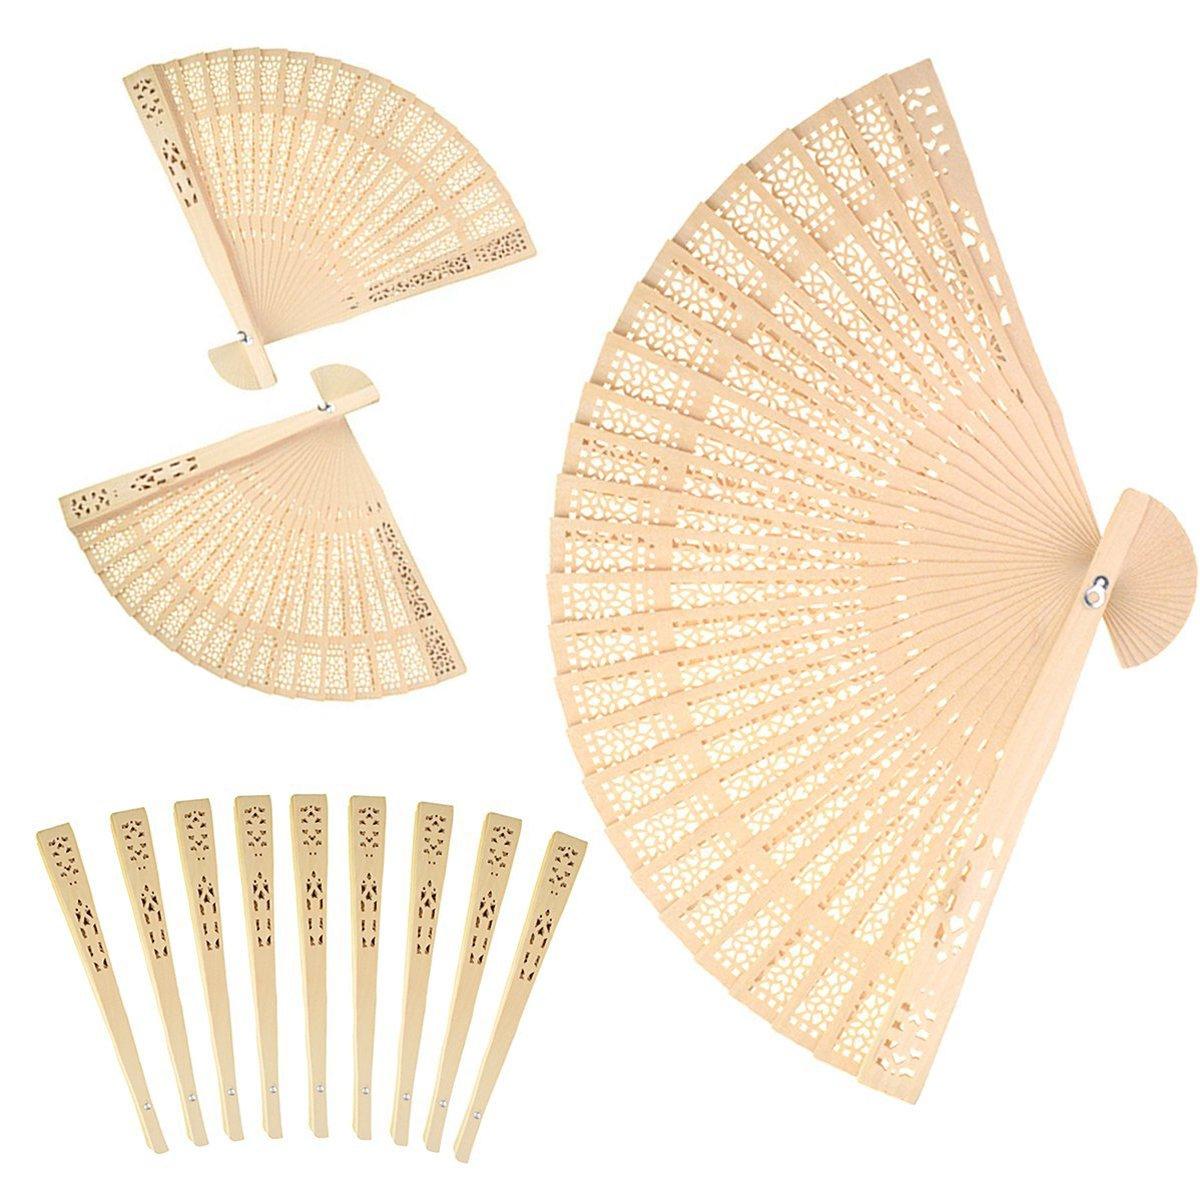 Aeroway Sandalwood Fan (Set of 48 pcs) - Baby Shower Gifts & Wedding